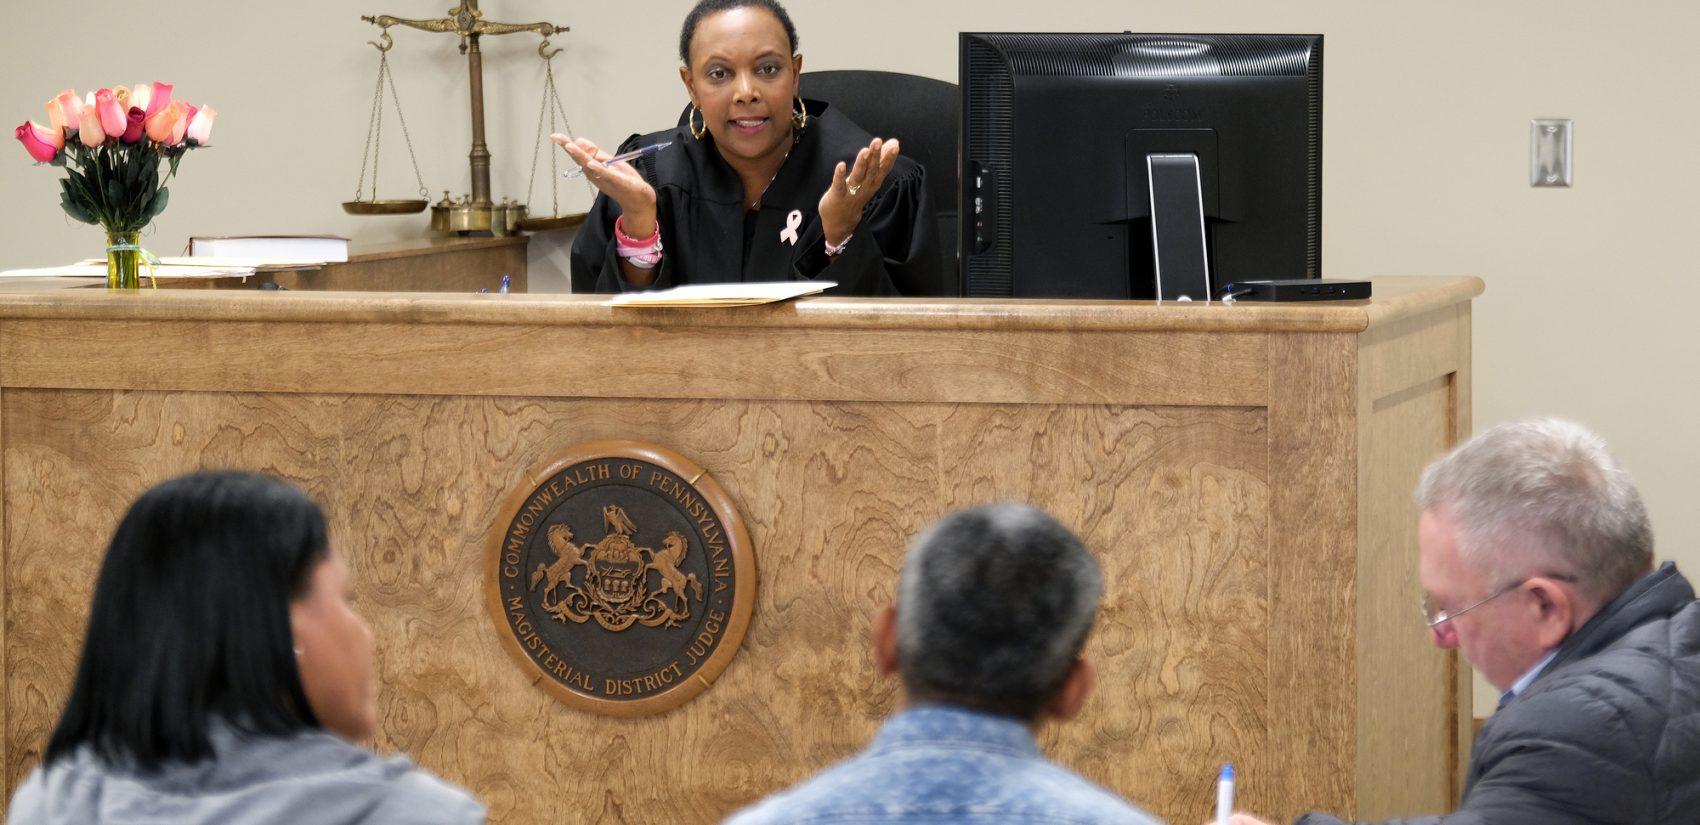 Judge Tonya Butler presides over a landlord-tenant case in Reading, Pennsylvania. (Matt Smith for Keystone Crossroads)